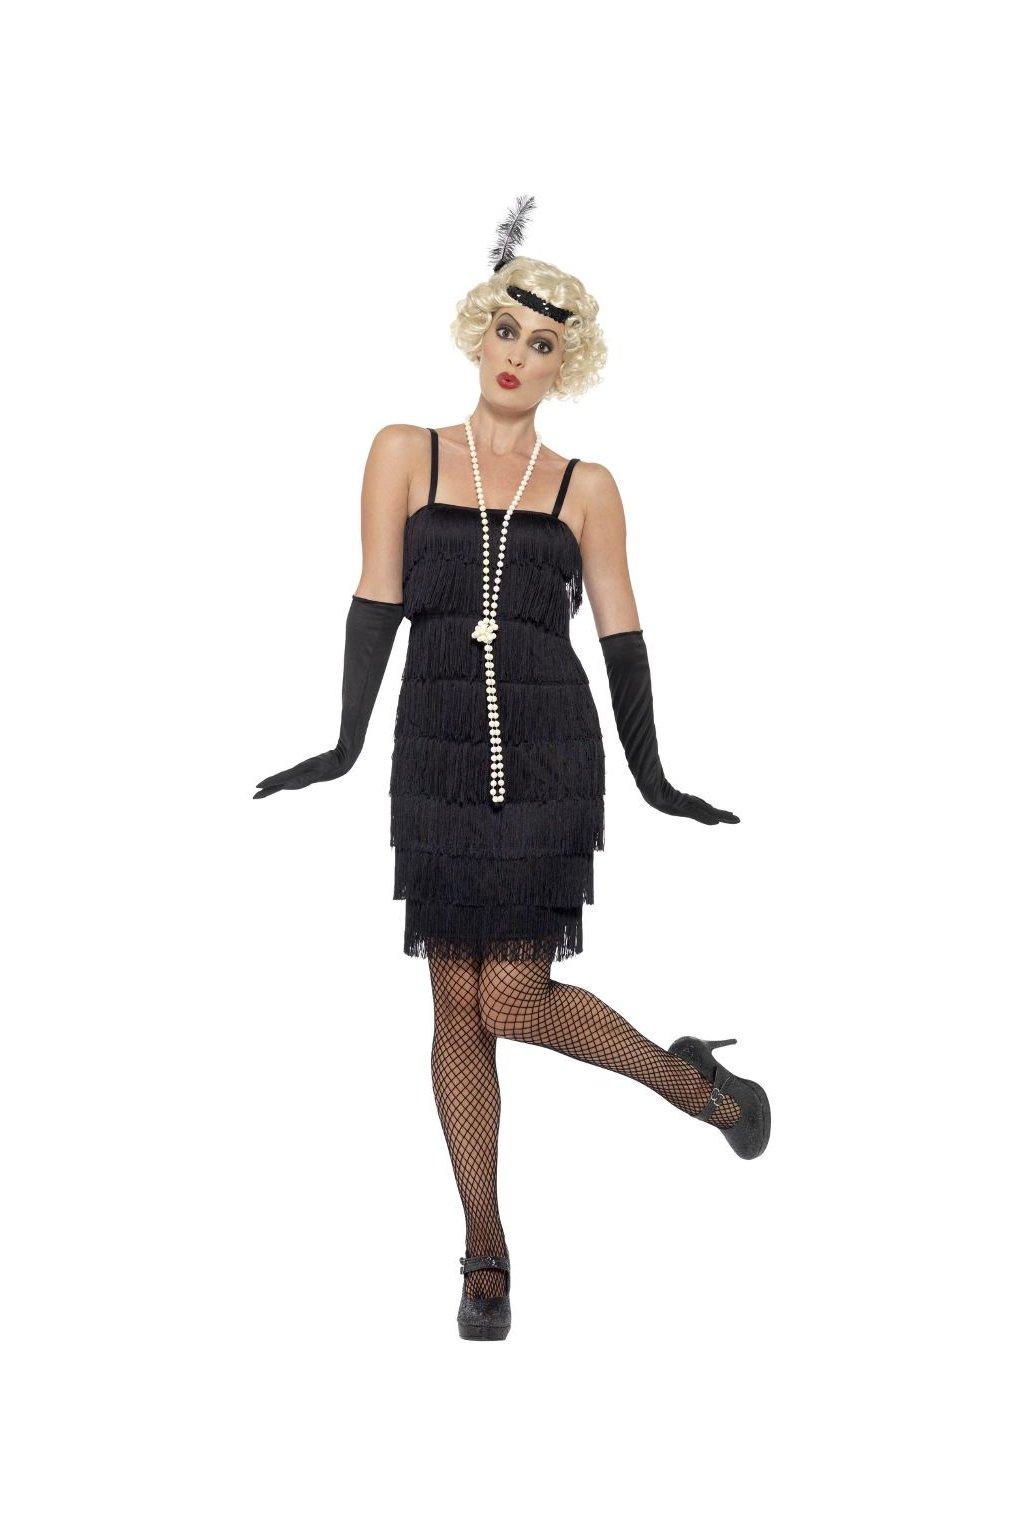 Charleston šaty s třásněmi 30. léta